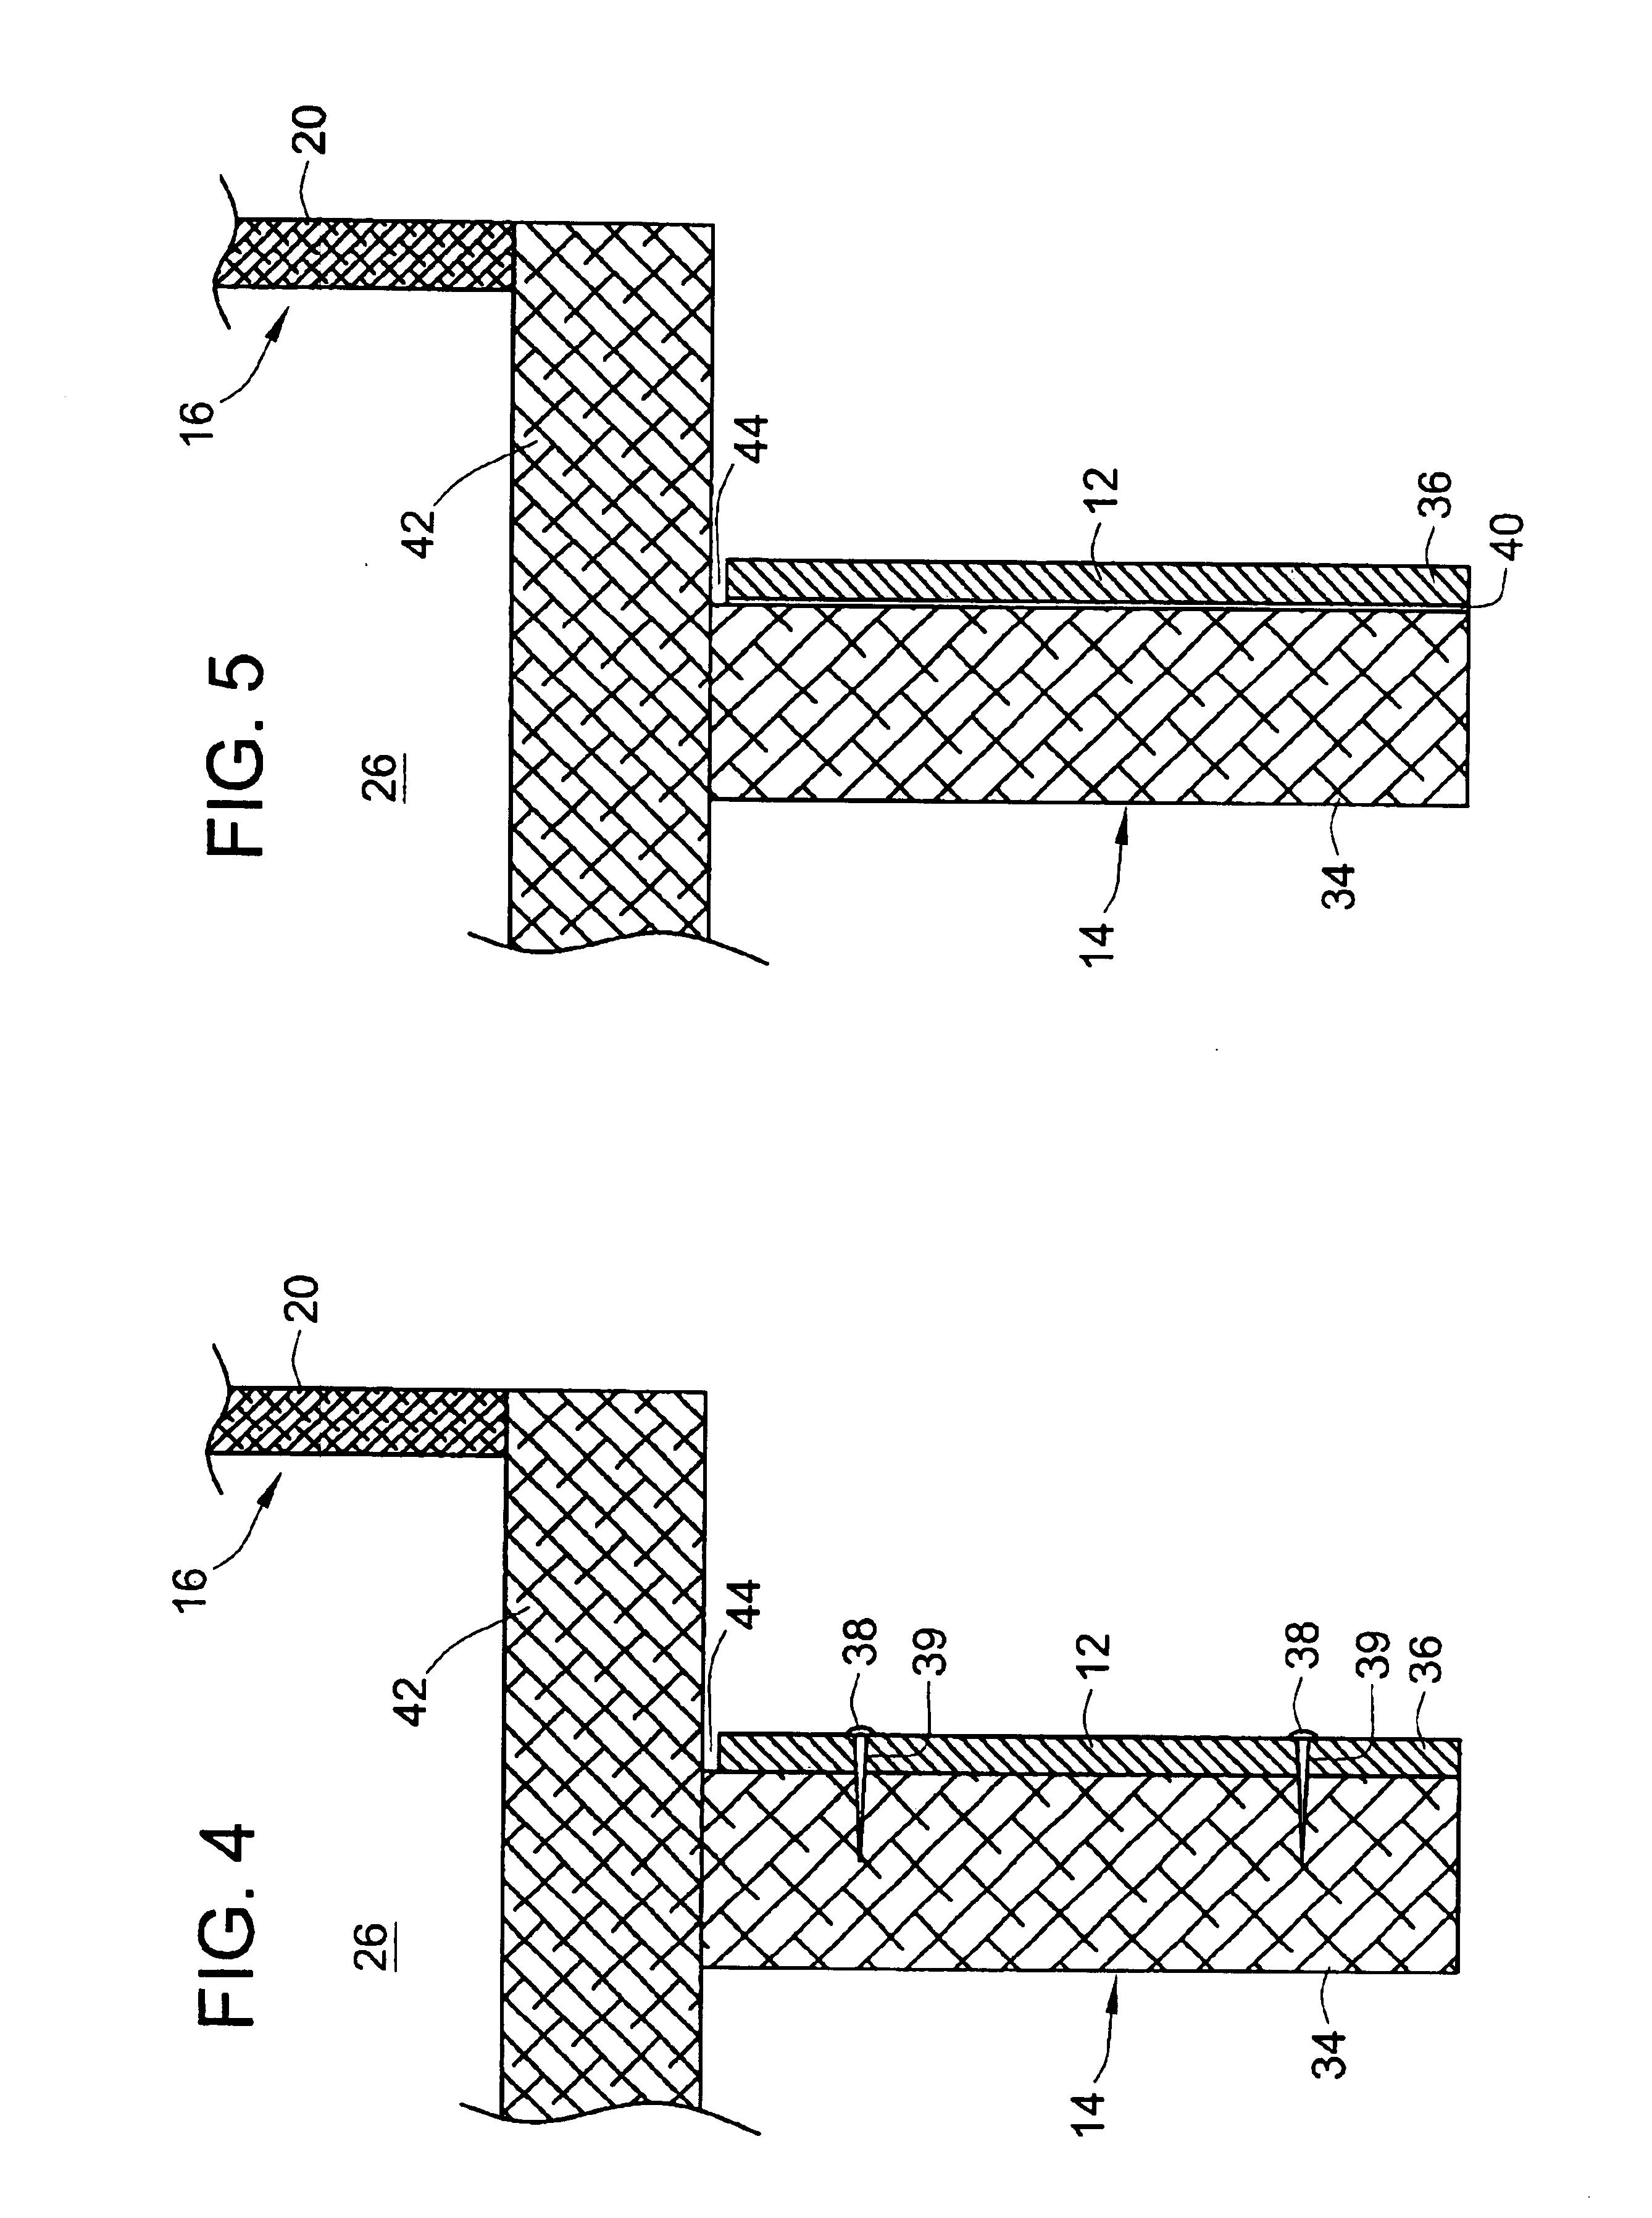 Kitchen cabinet kickboard dimensions - Patent Drawing